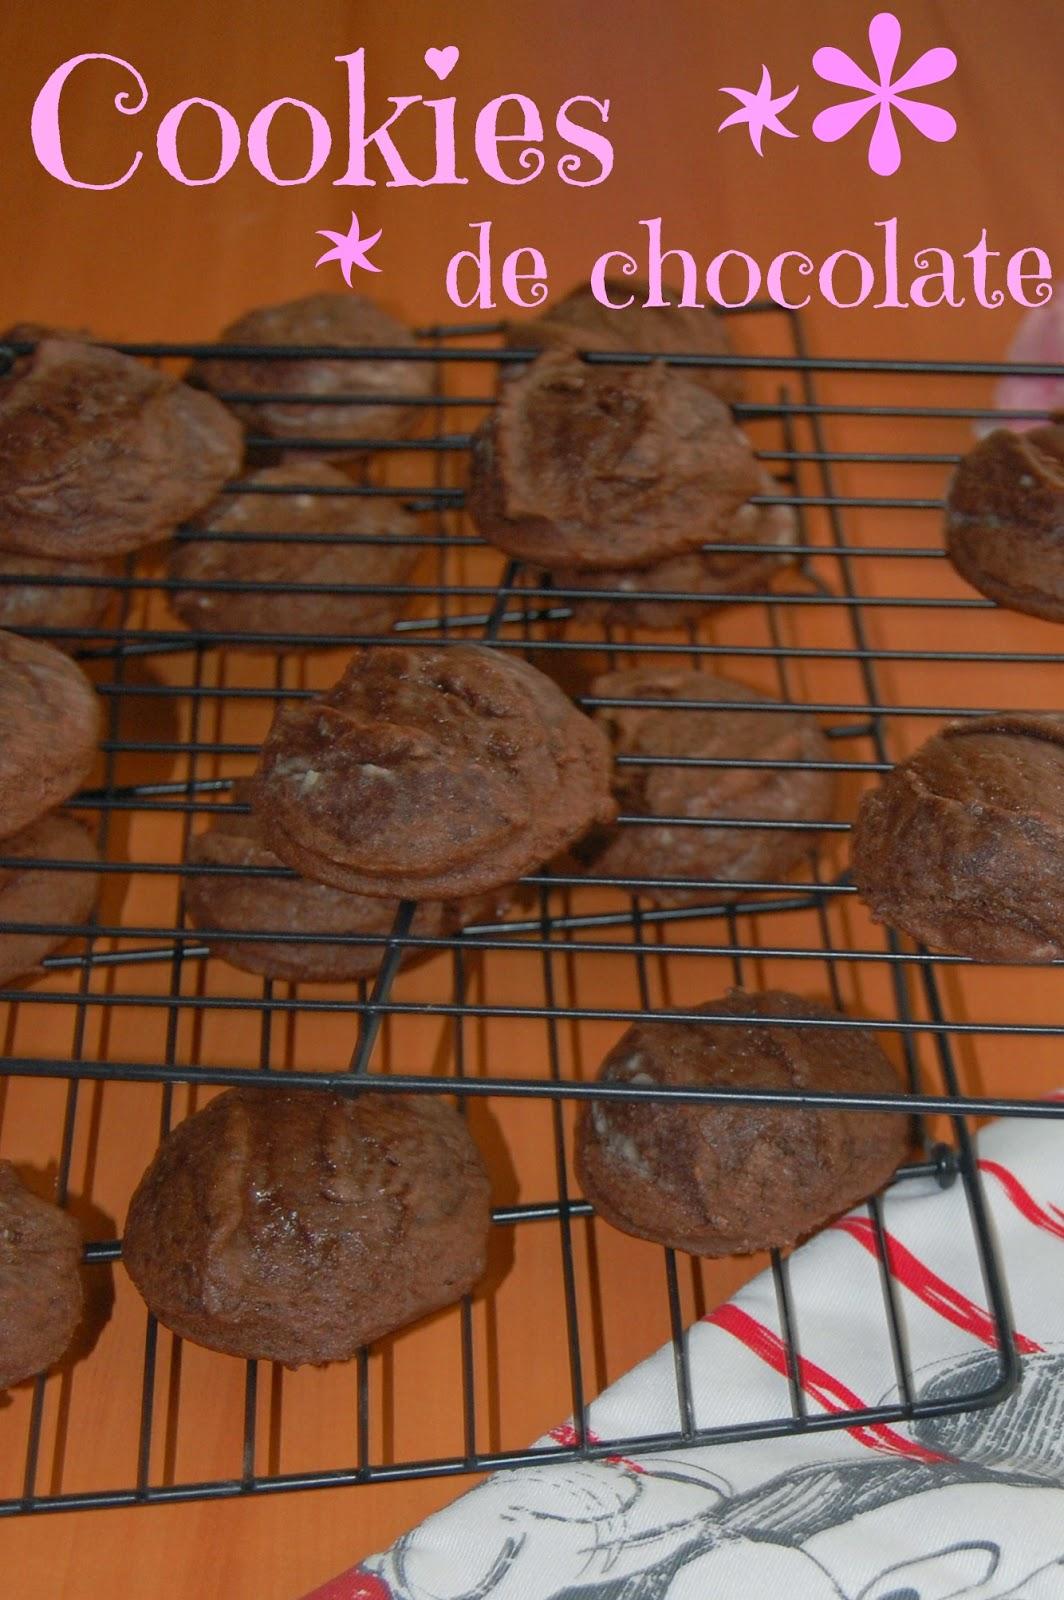 http://azucarenmicocina.blogspot.com.es/2014/11/cookies-de-chocolate.html